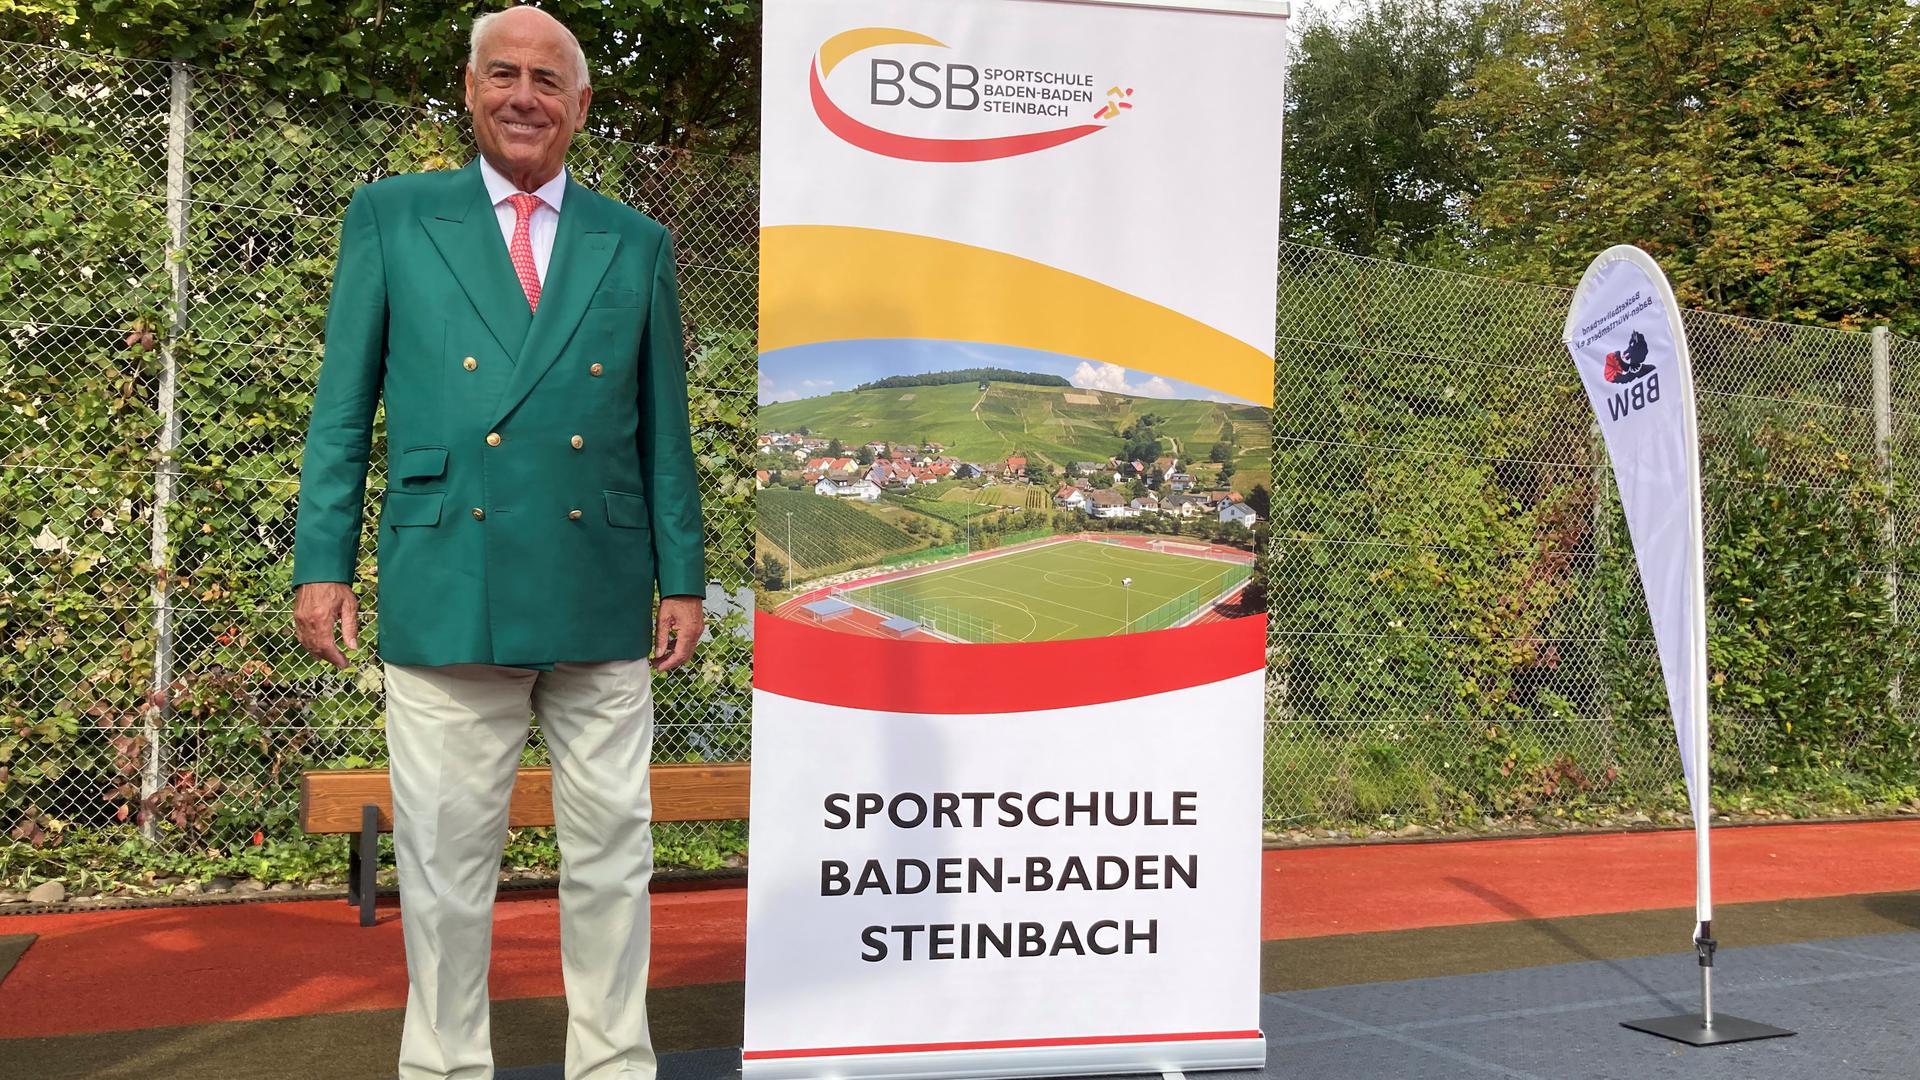 Gundolf Fleischer, BSB-Präsident, September 2021